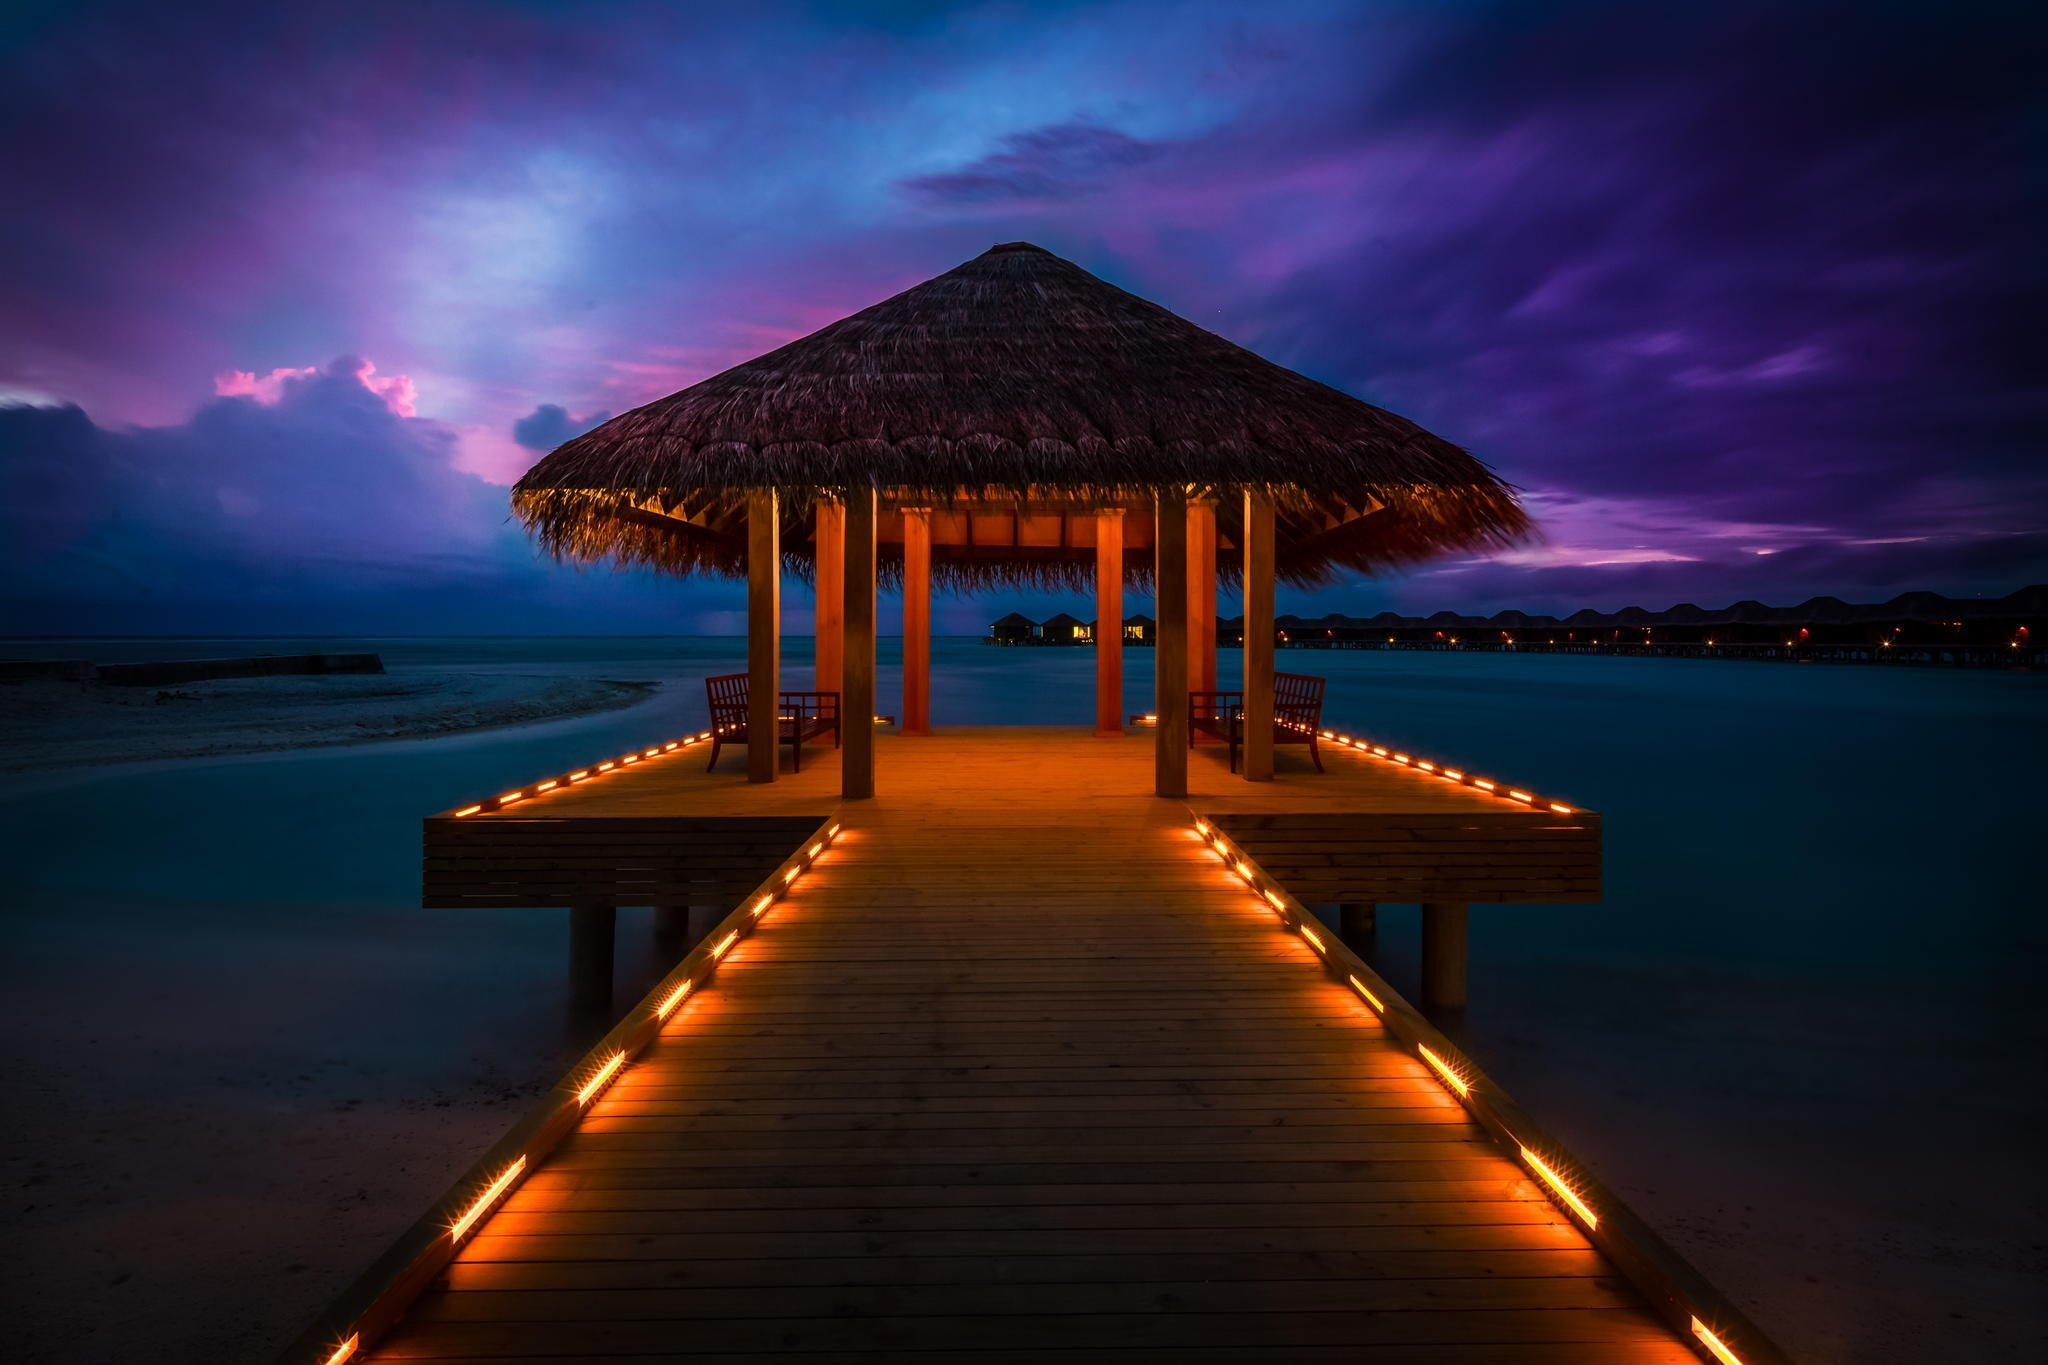 maldives sunset sun bungalows ocean lights landscape wallpaper